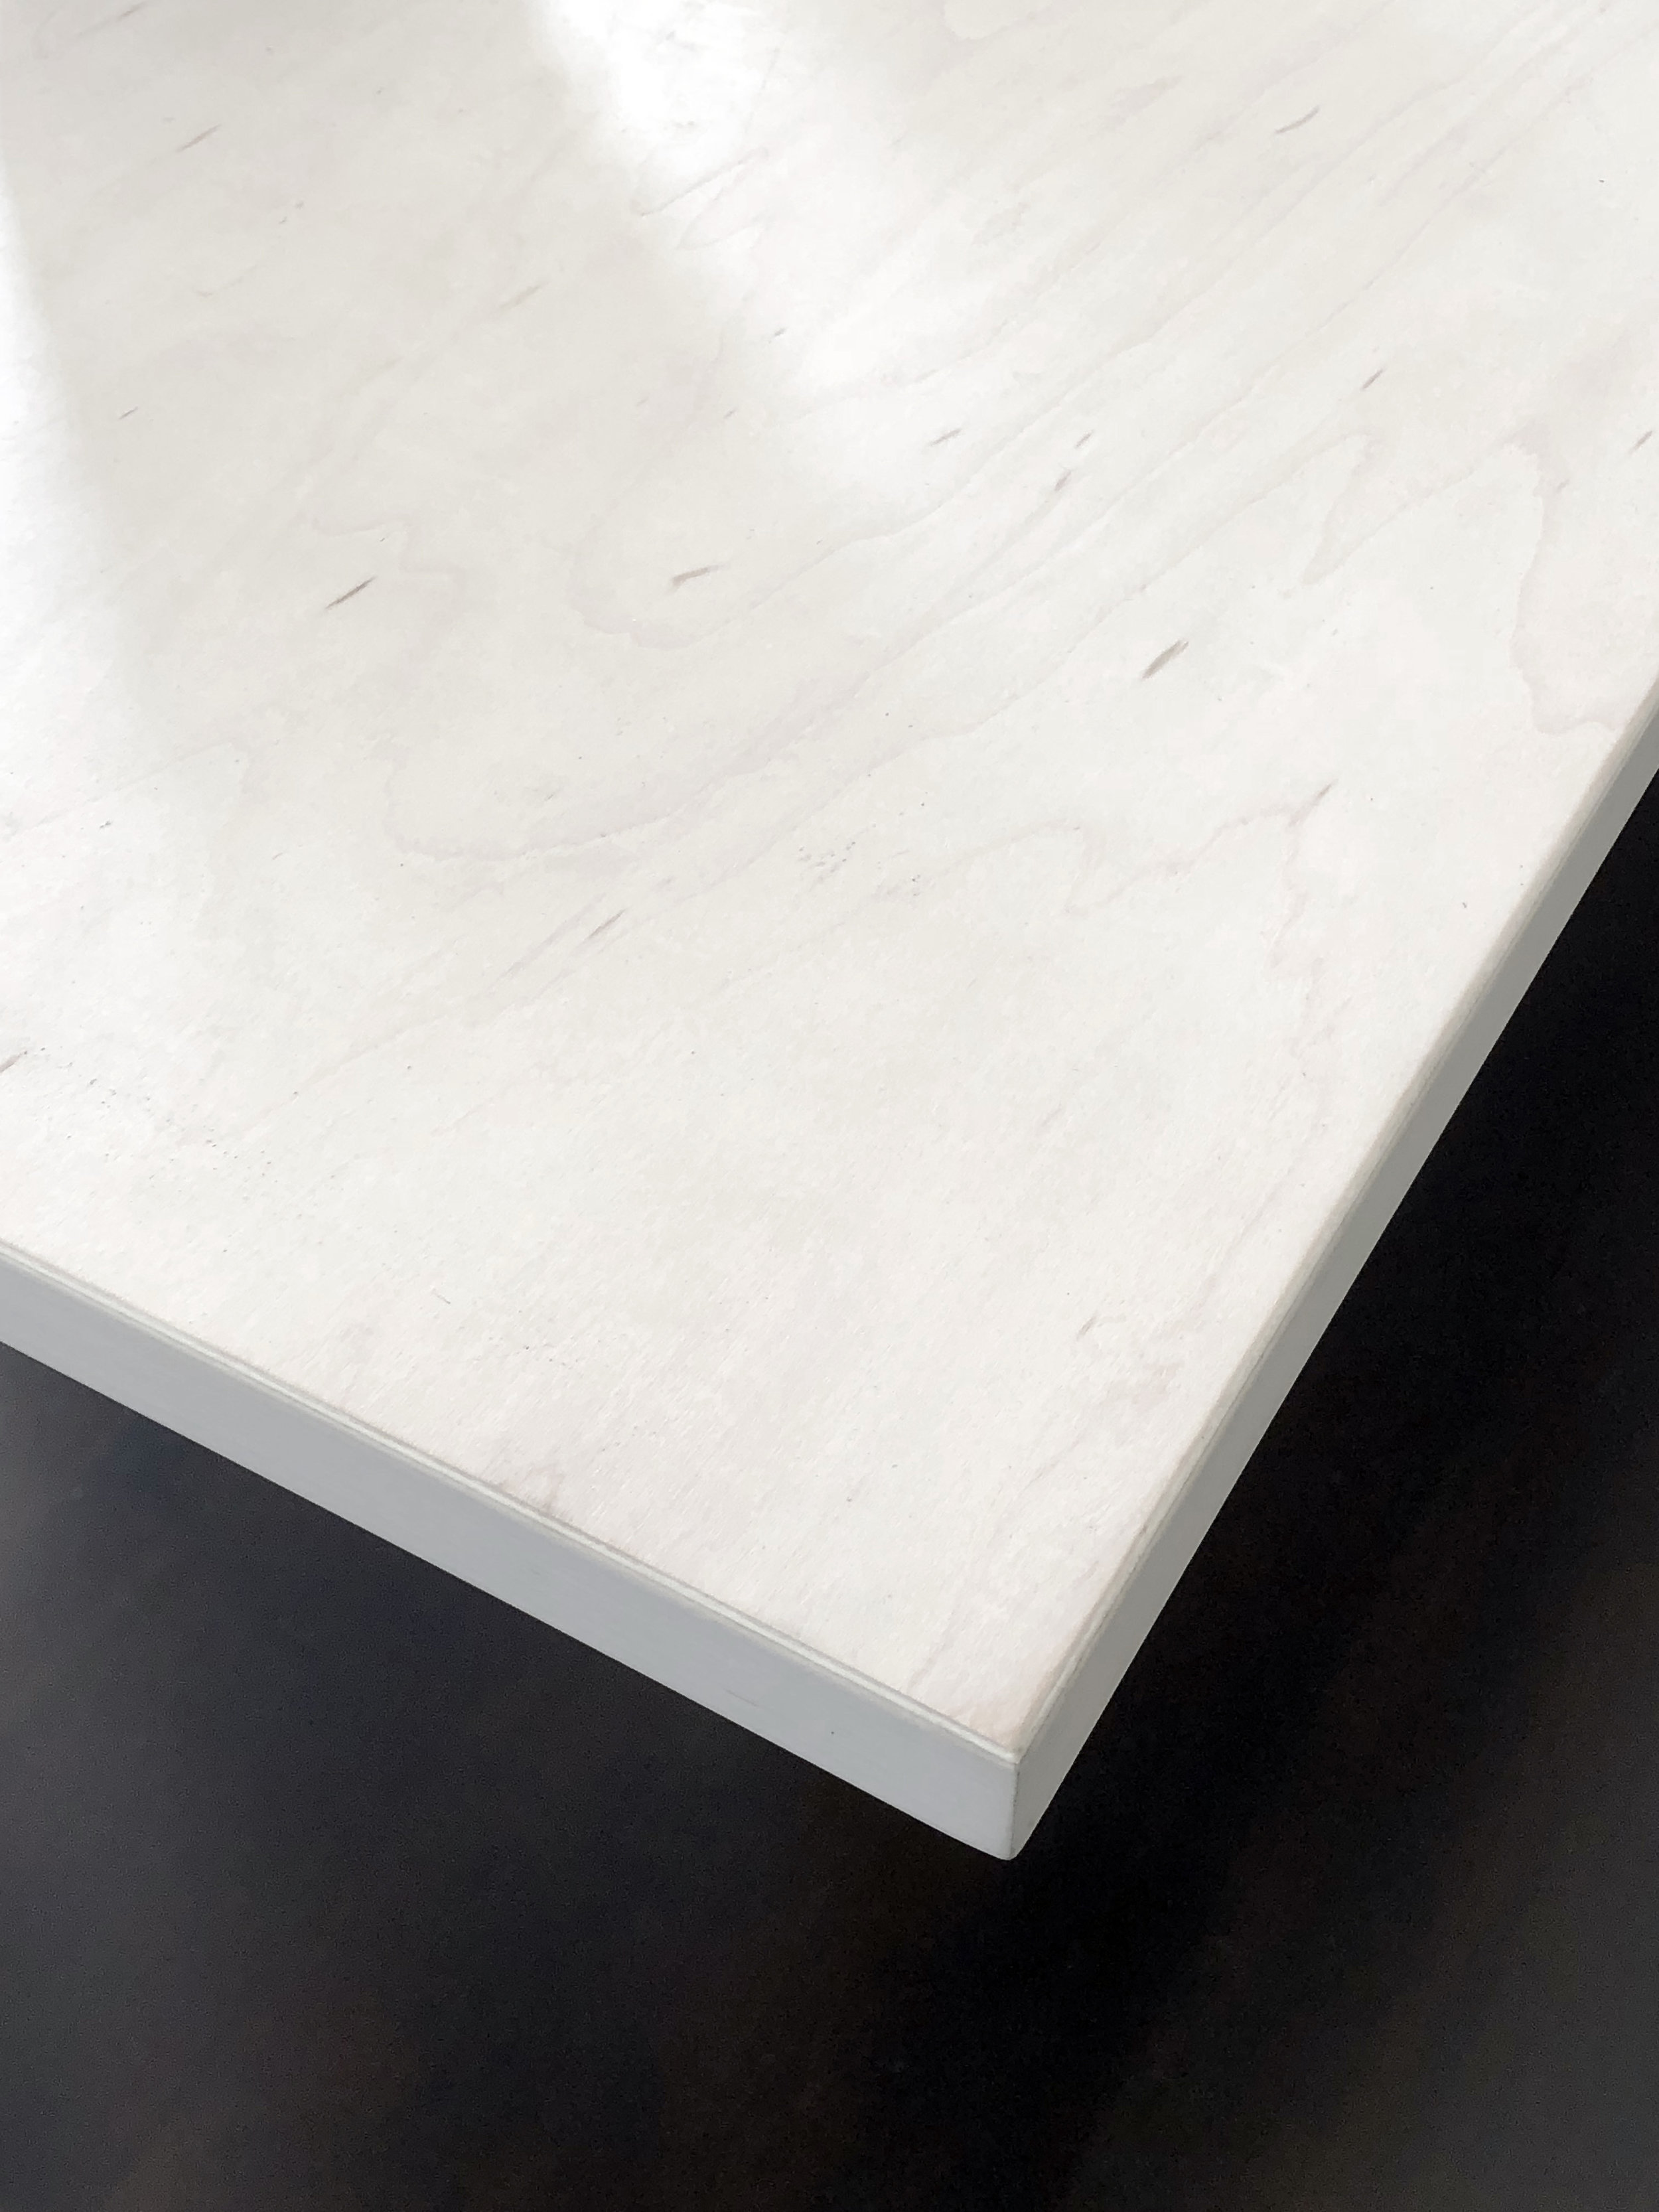 4 Table Detail.JPG